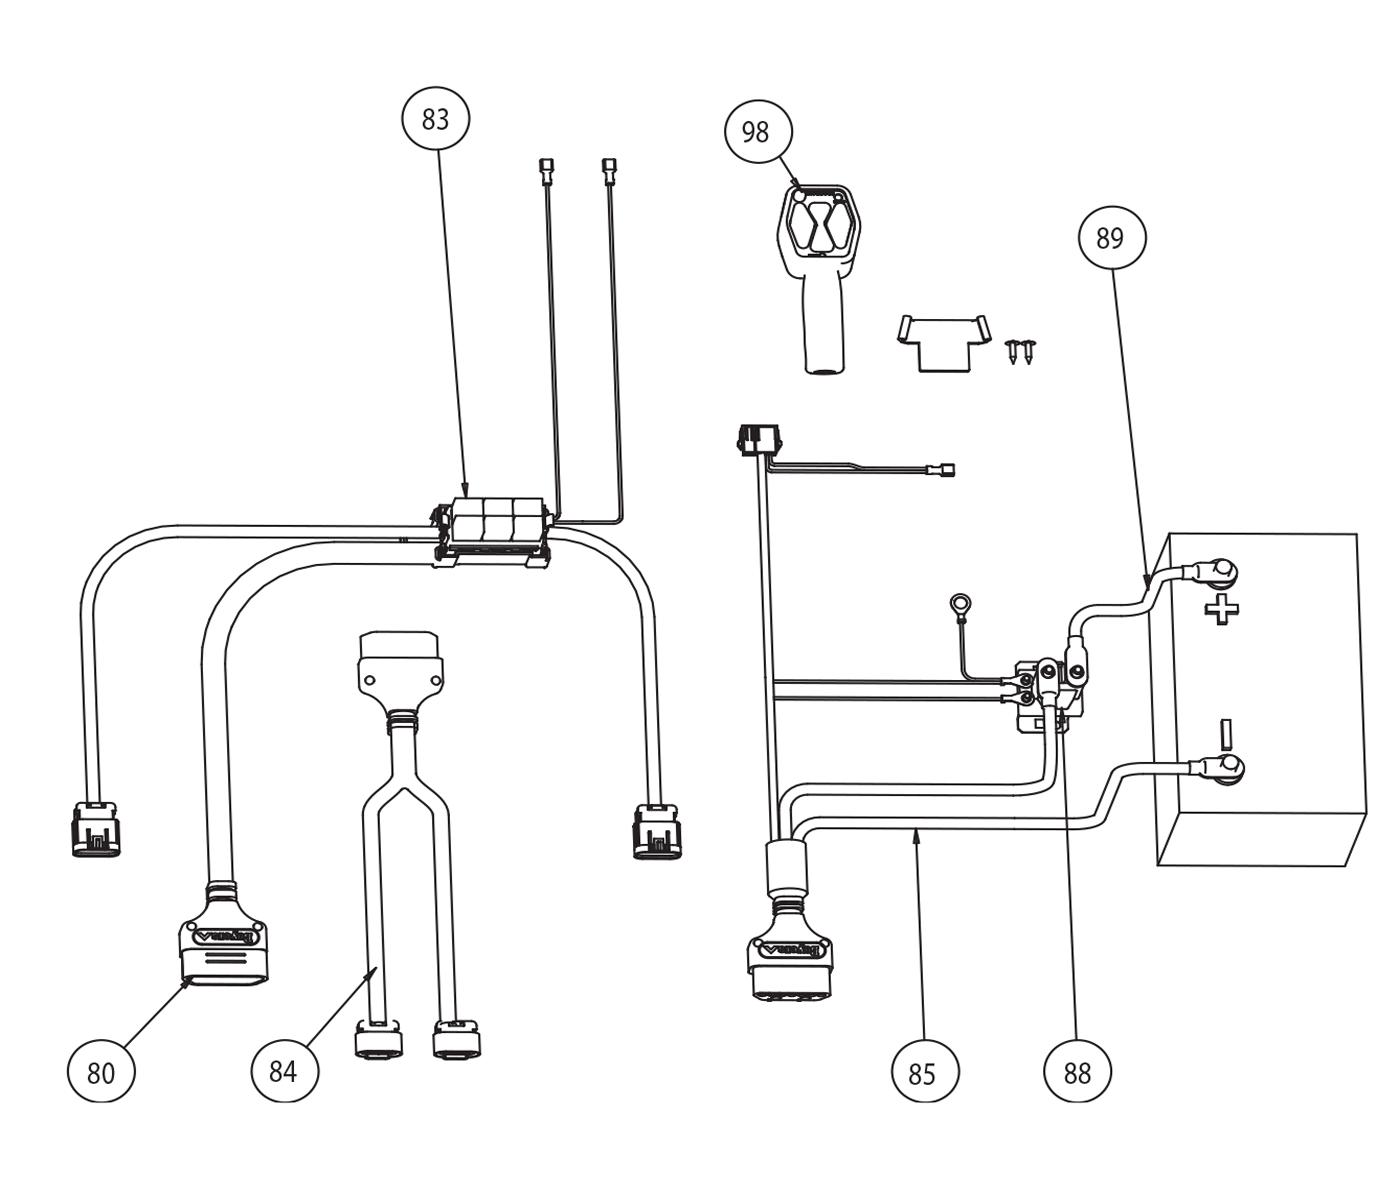 snowdog 1500 wiring harness   27 wiring diagram images